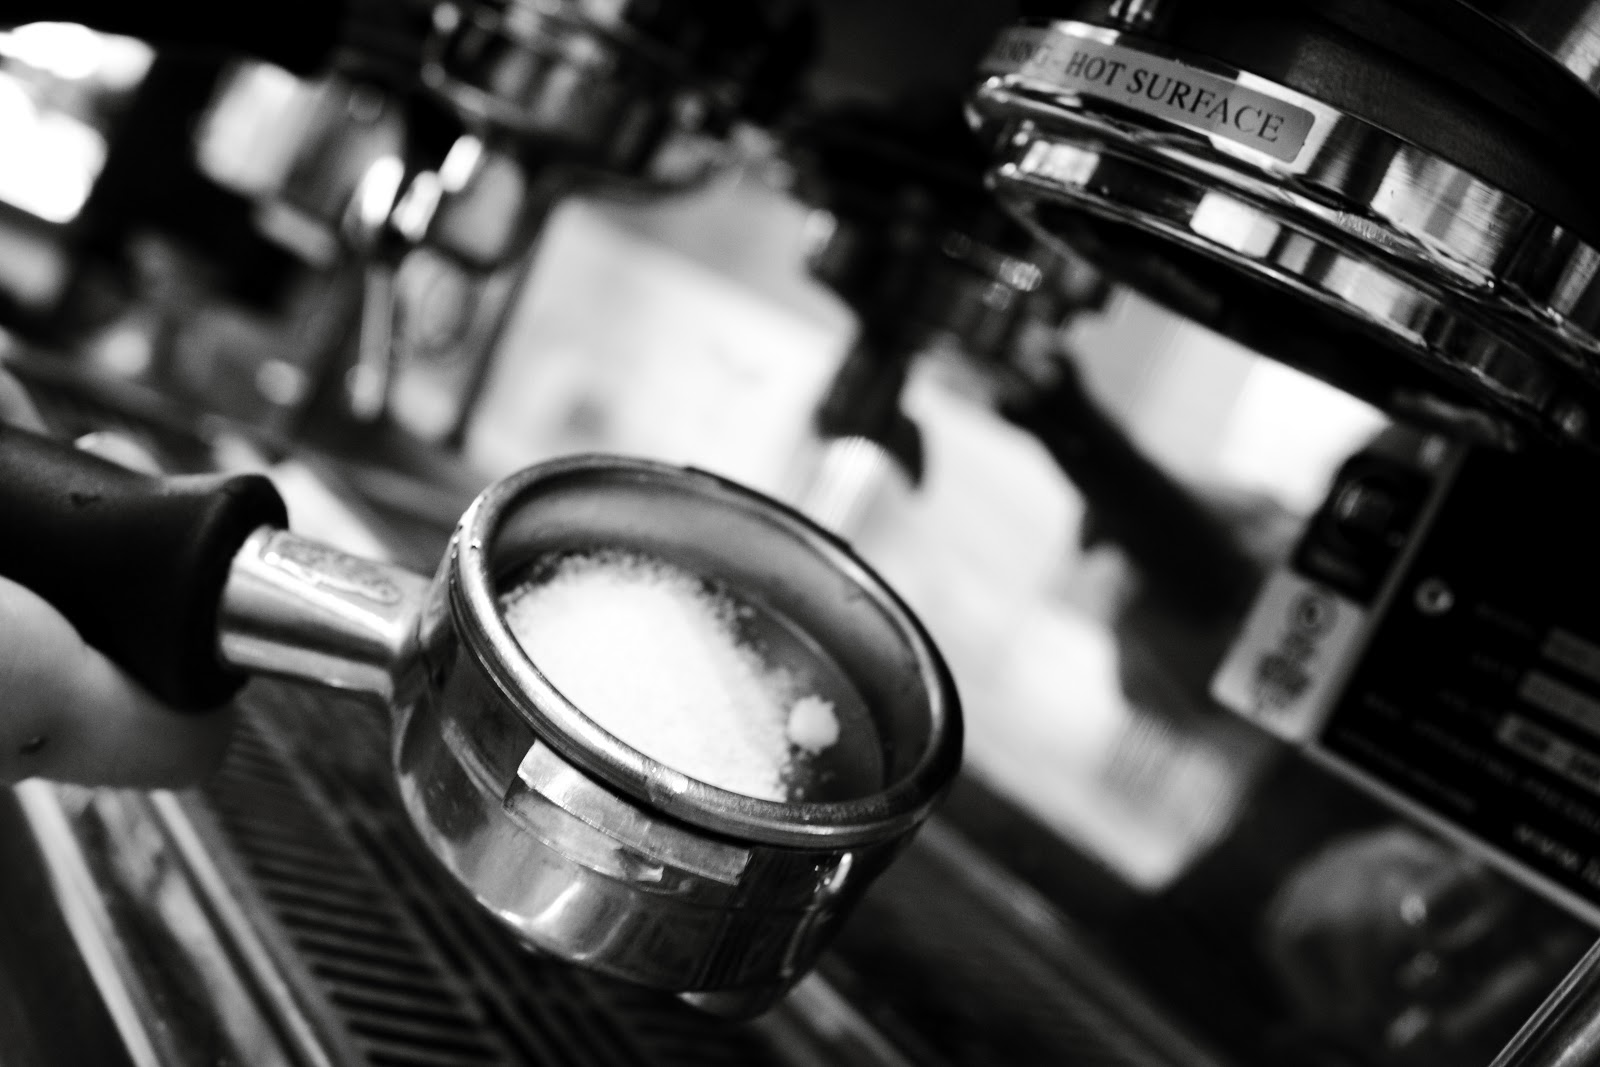 portafiltro con cafe listo para extraer espressos